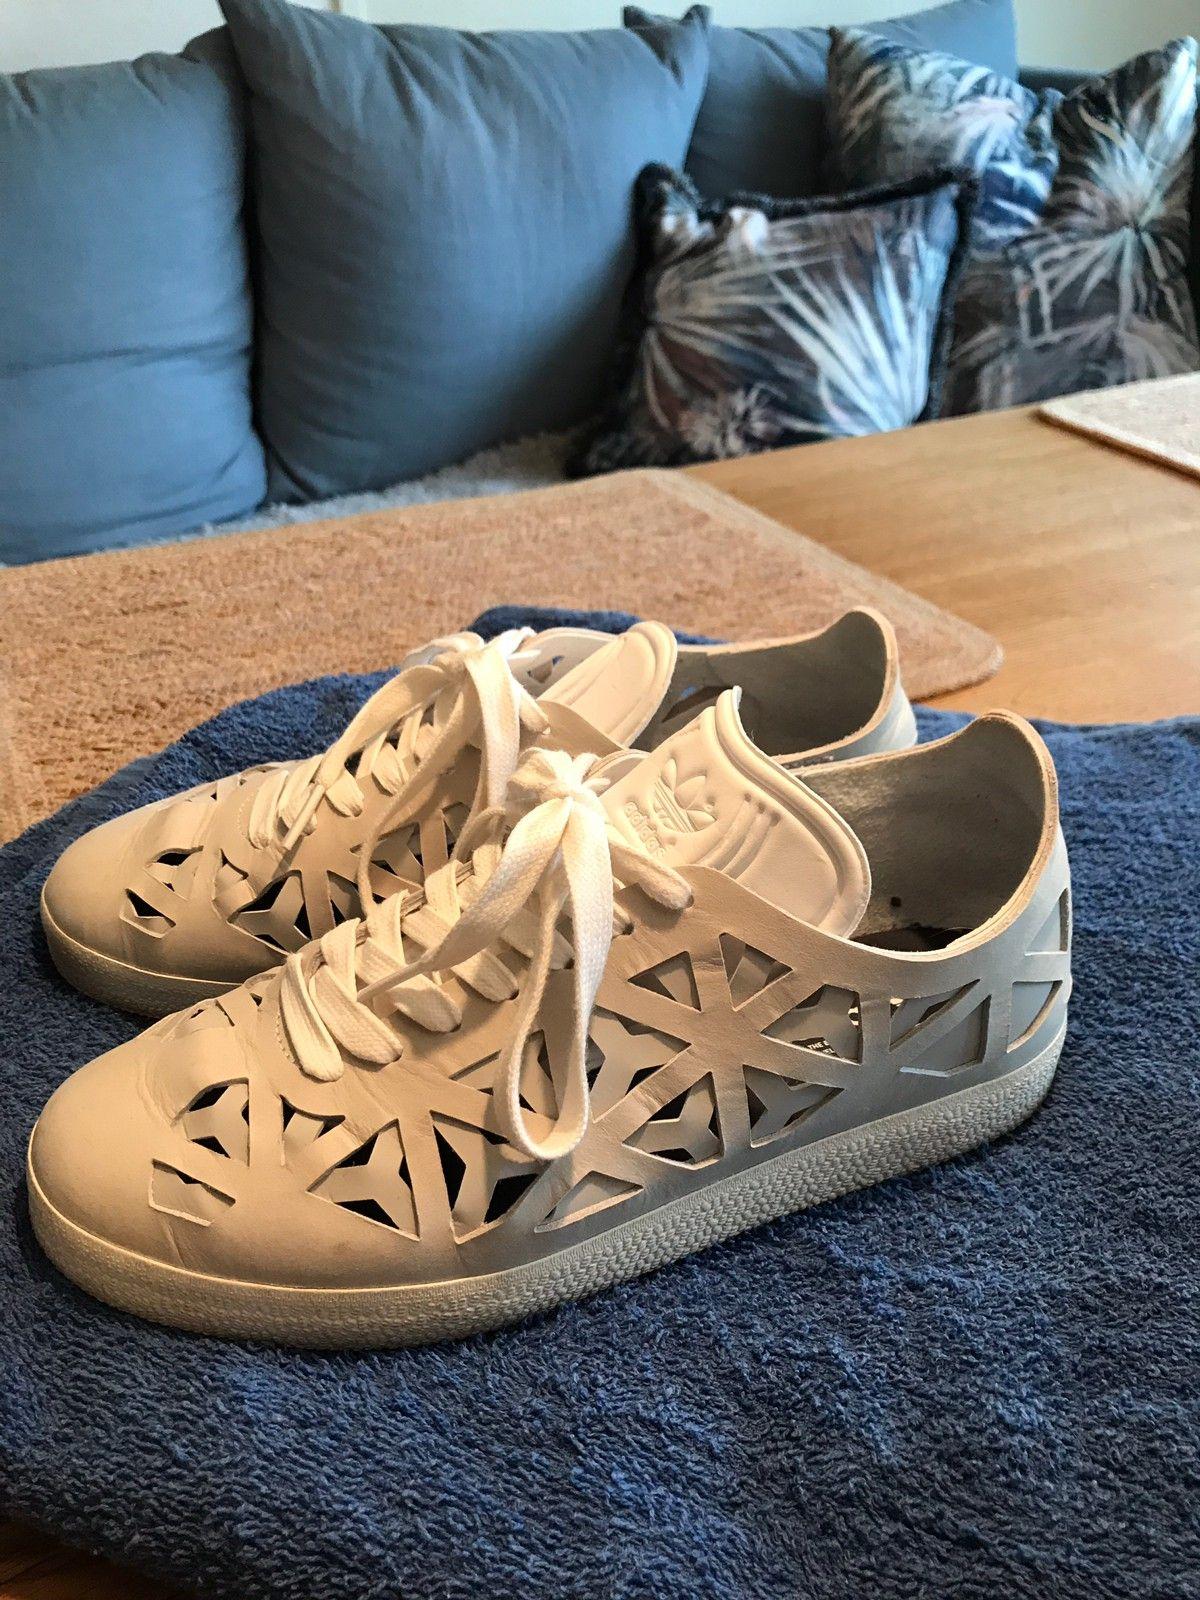 Kule Adidas grå skinn joggesko, limited edition | FINN.no